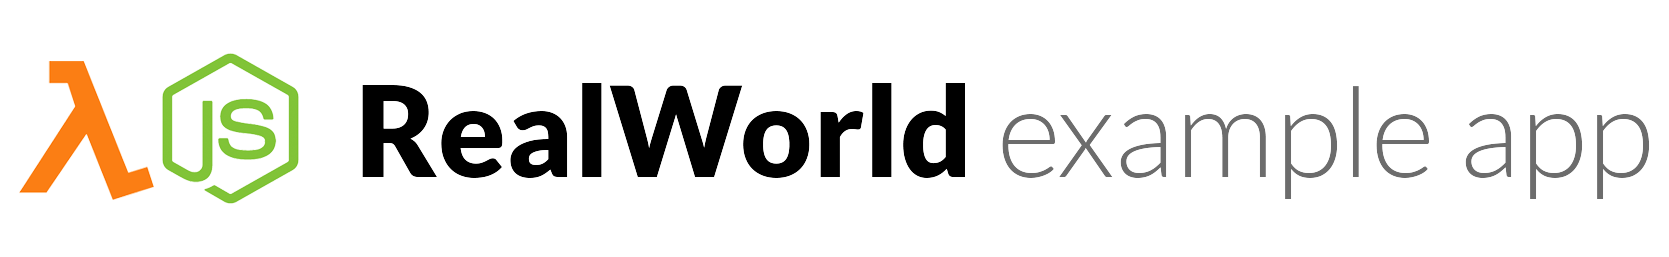 RealWorld Example App